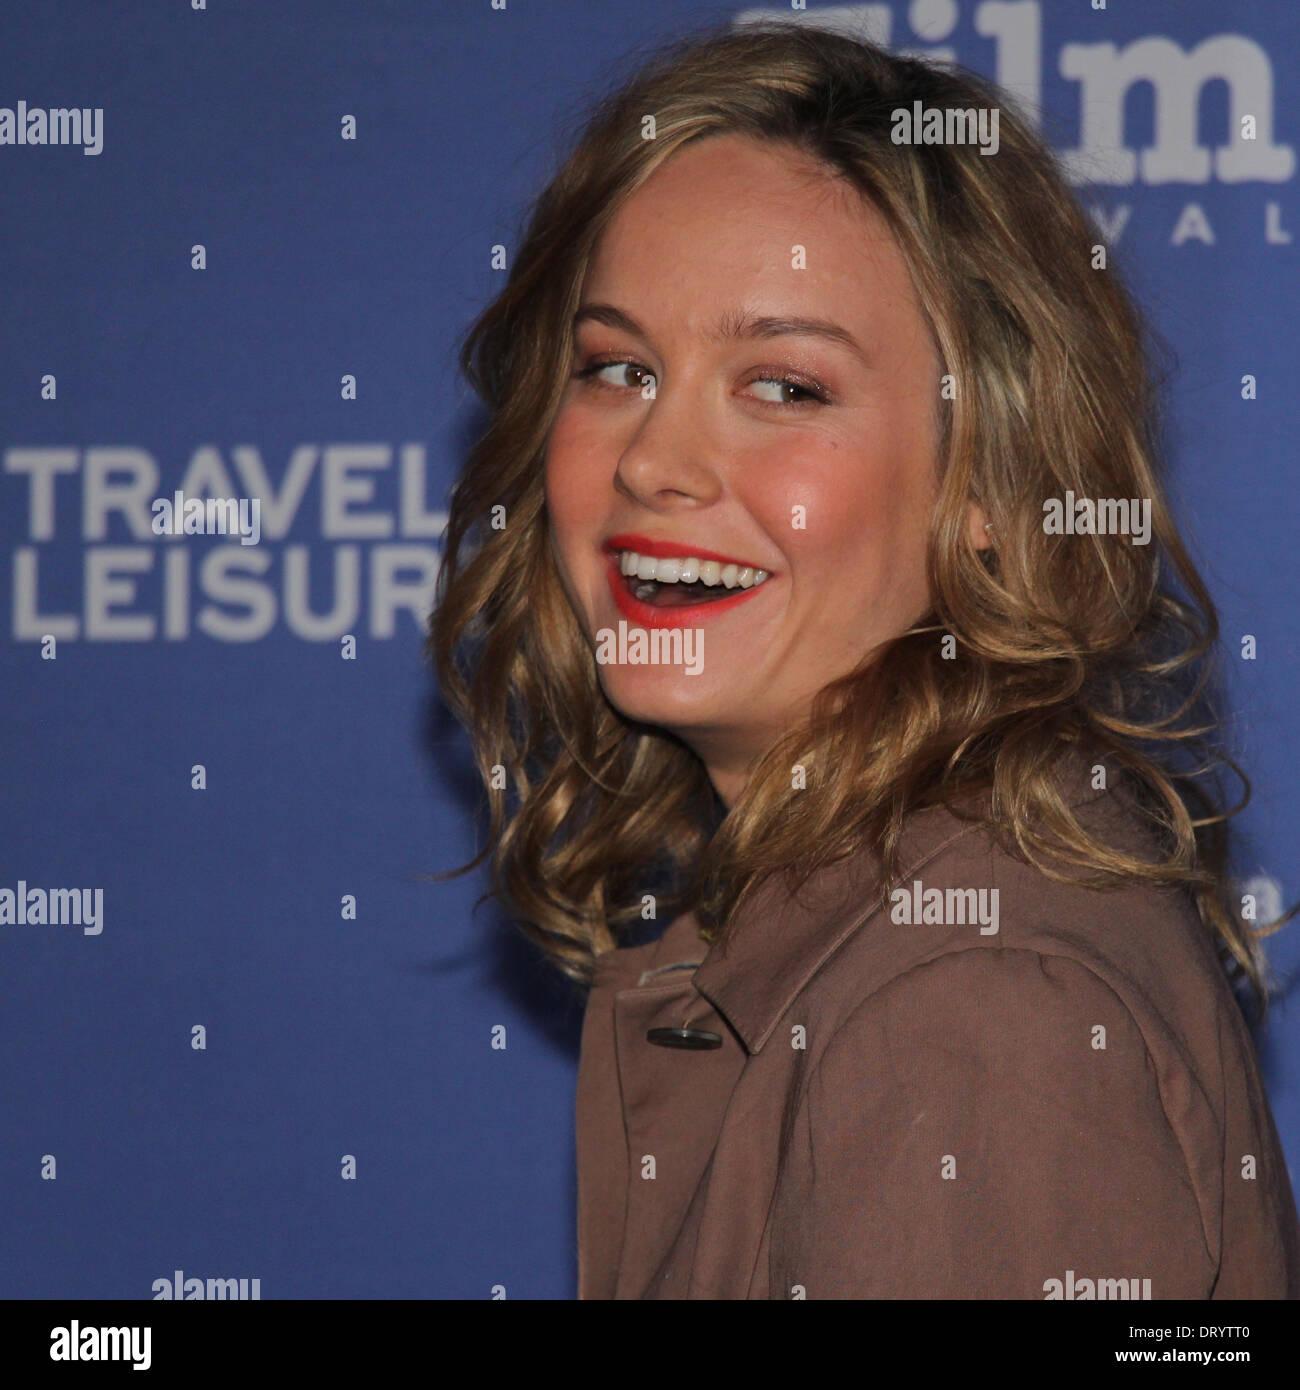 Brie Larson (Short Term 12, Don Jon, United States of Tara